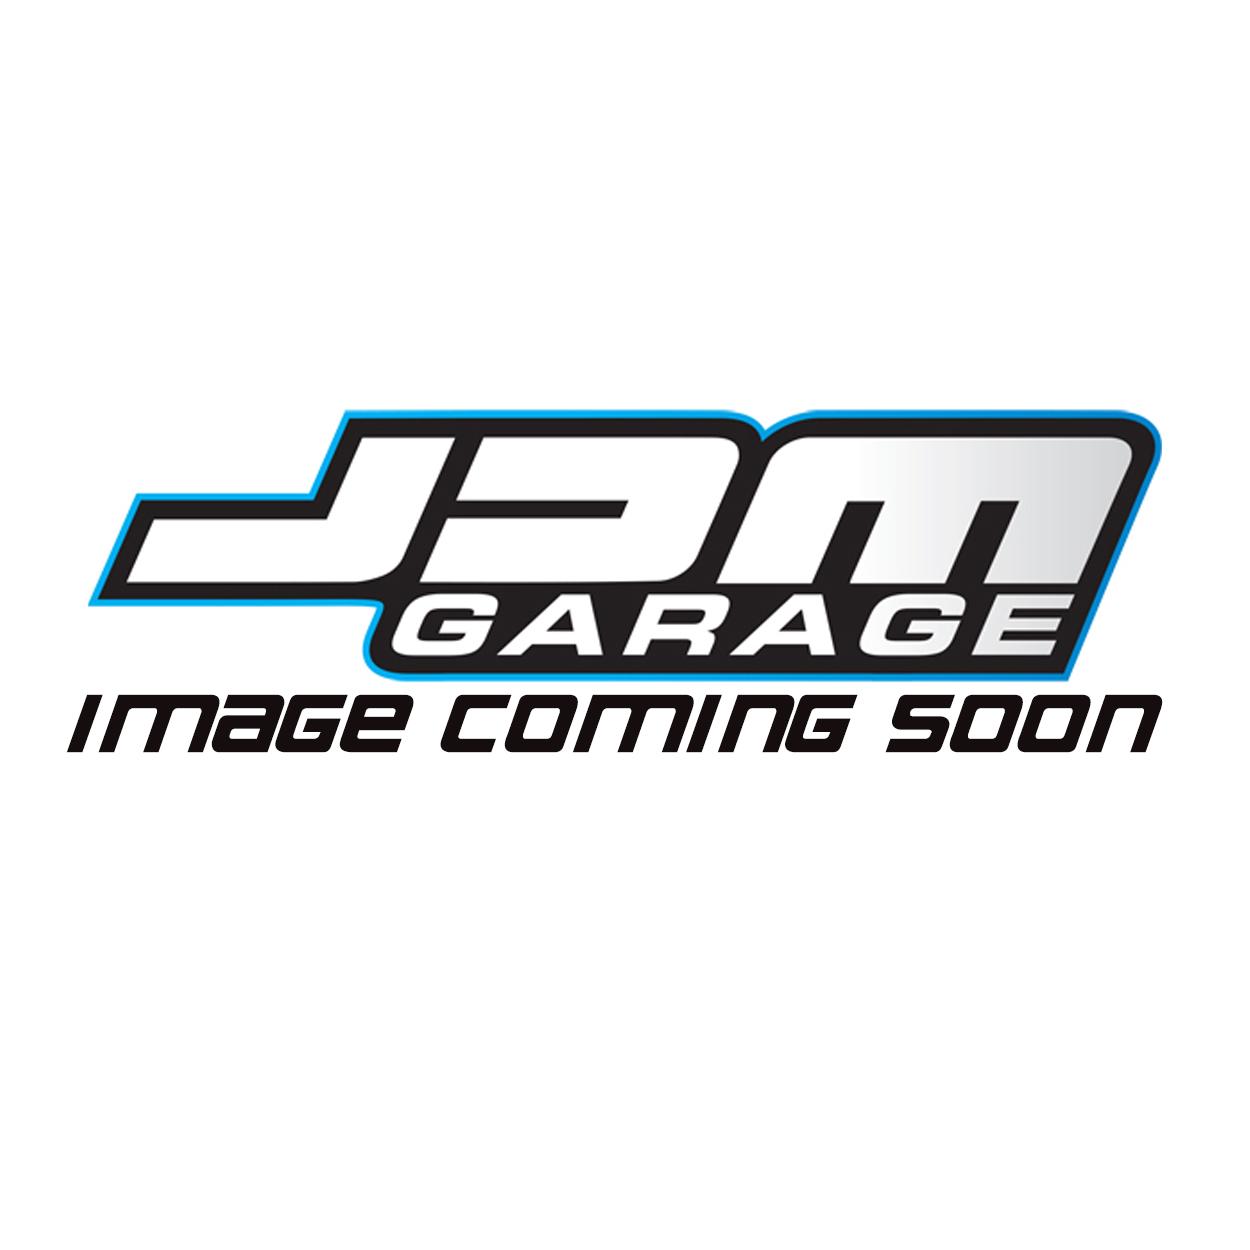 HKS Floor Mat Front / Rear Set For Toyota Yaris GR GXPA16